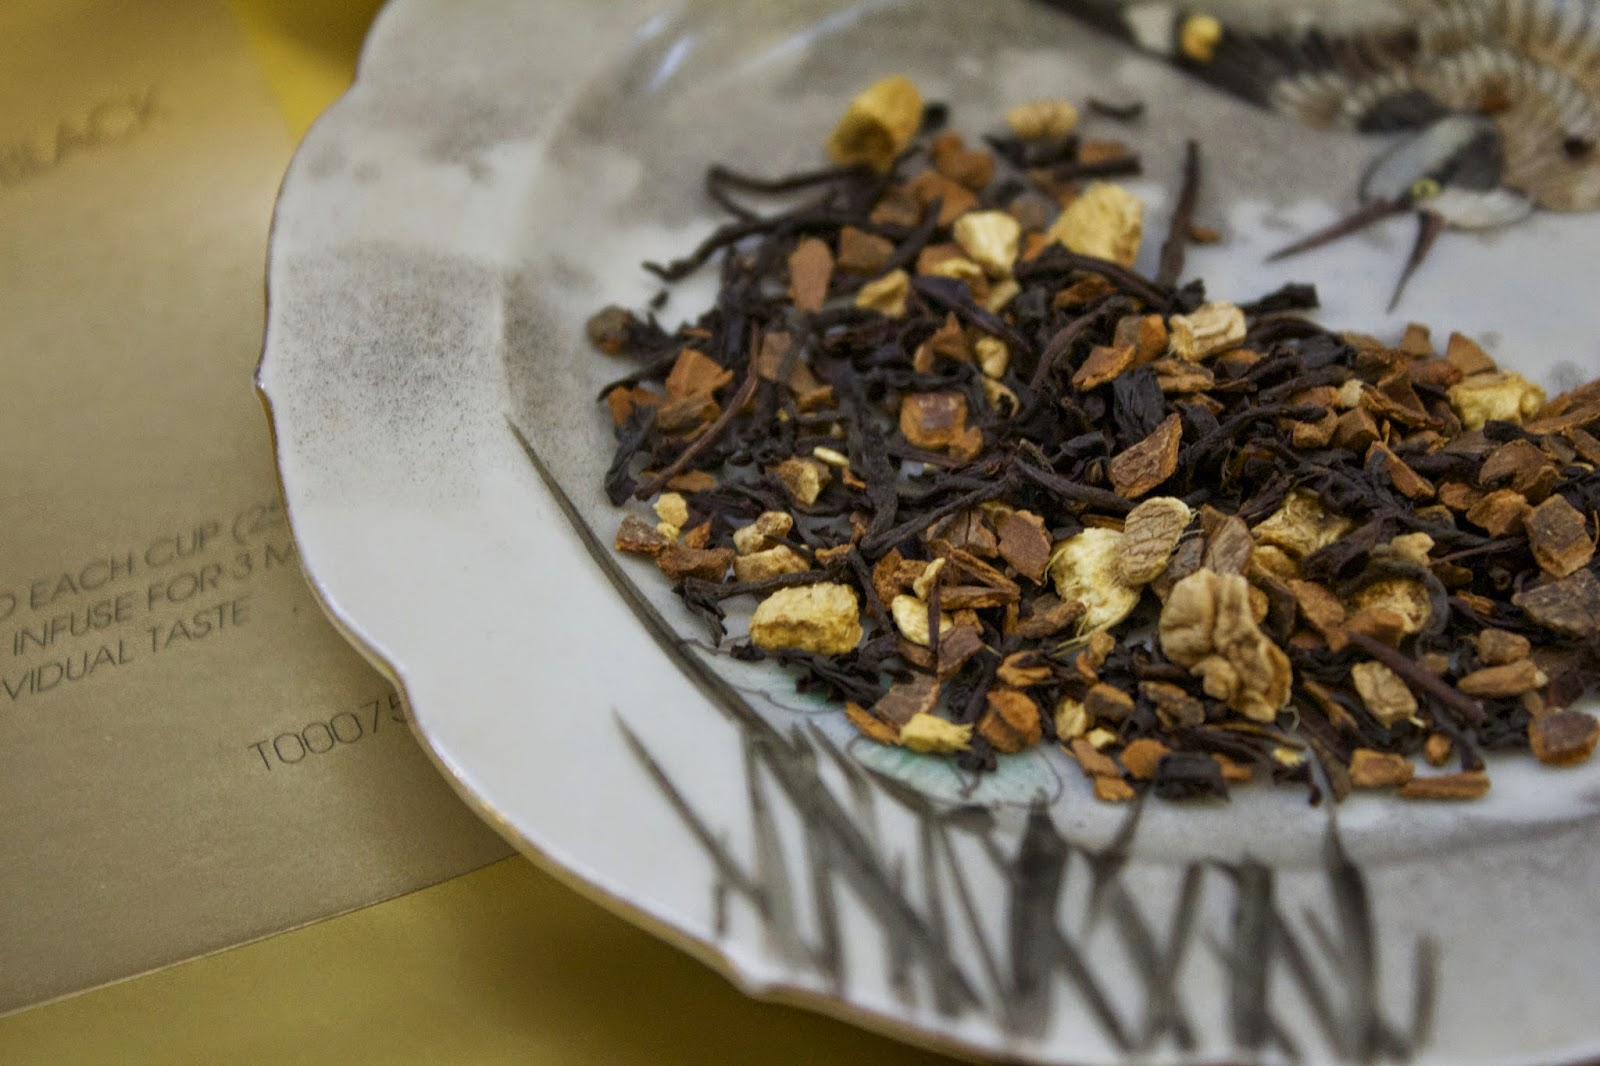 Black Teas from Jing Tea